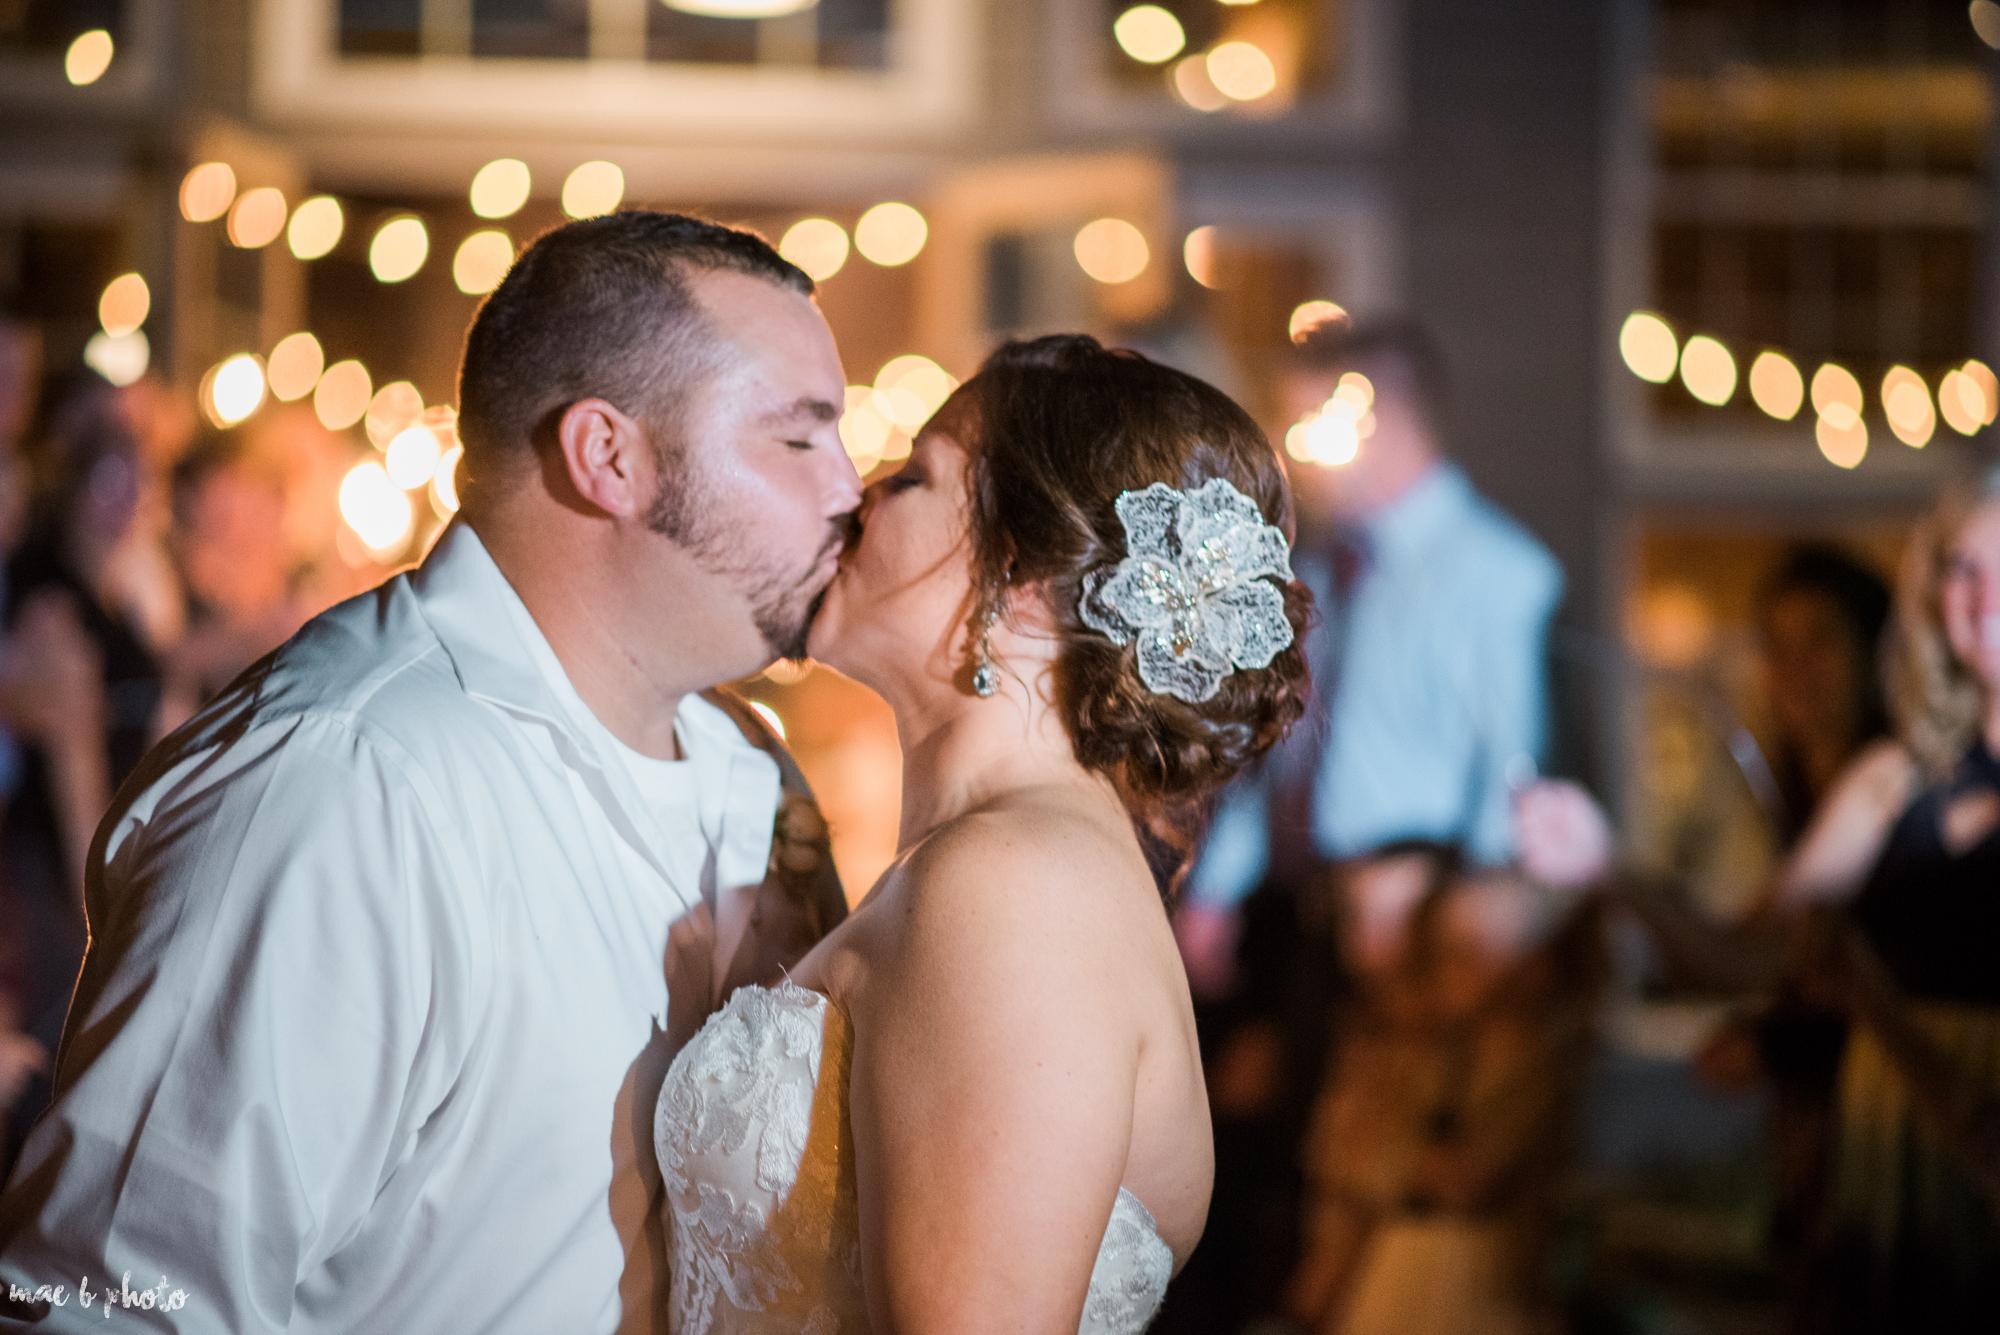 Sarah & Dustin's Rustic Chic Barn Wedding at Hartford Hill Winery in Hartford, Ohio by Mae B Photo-110.jpg